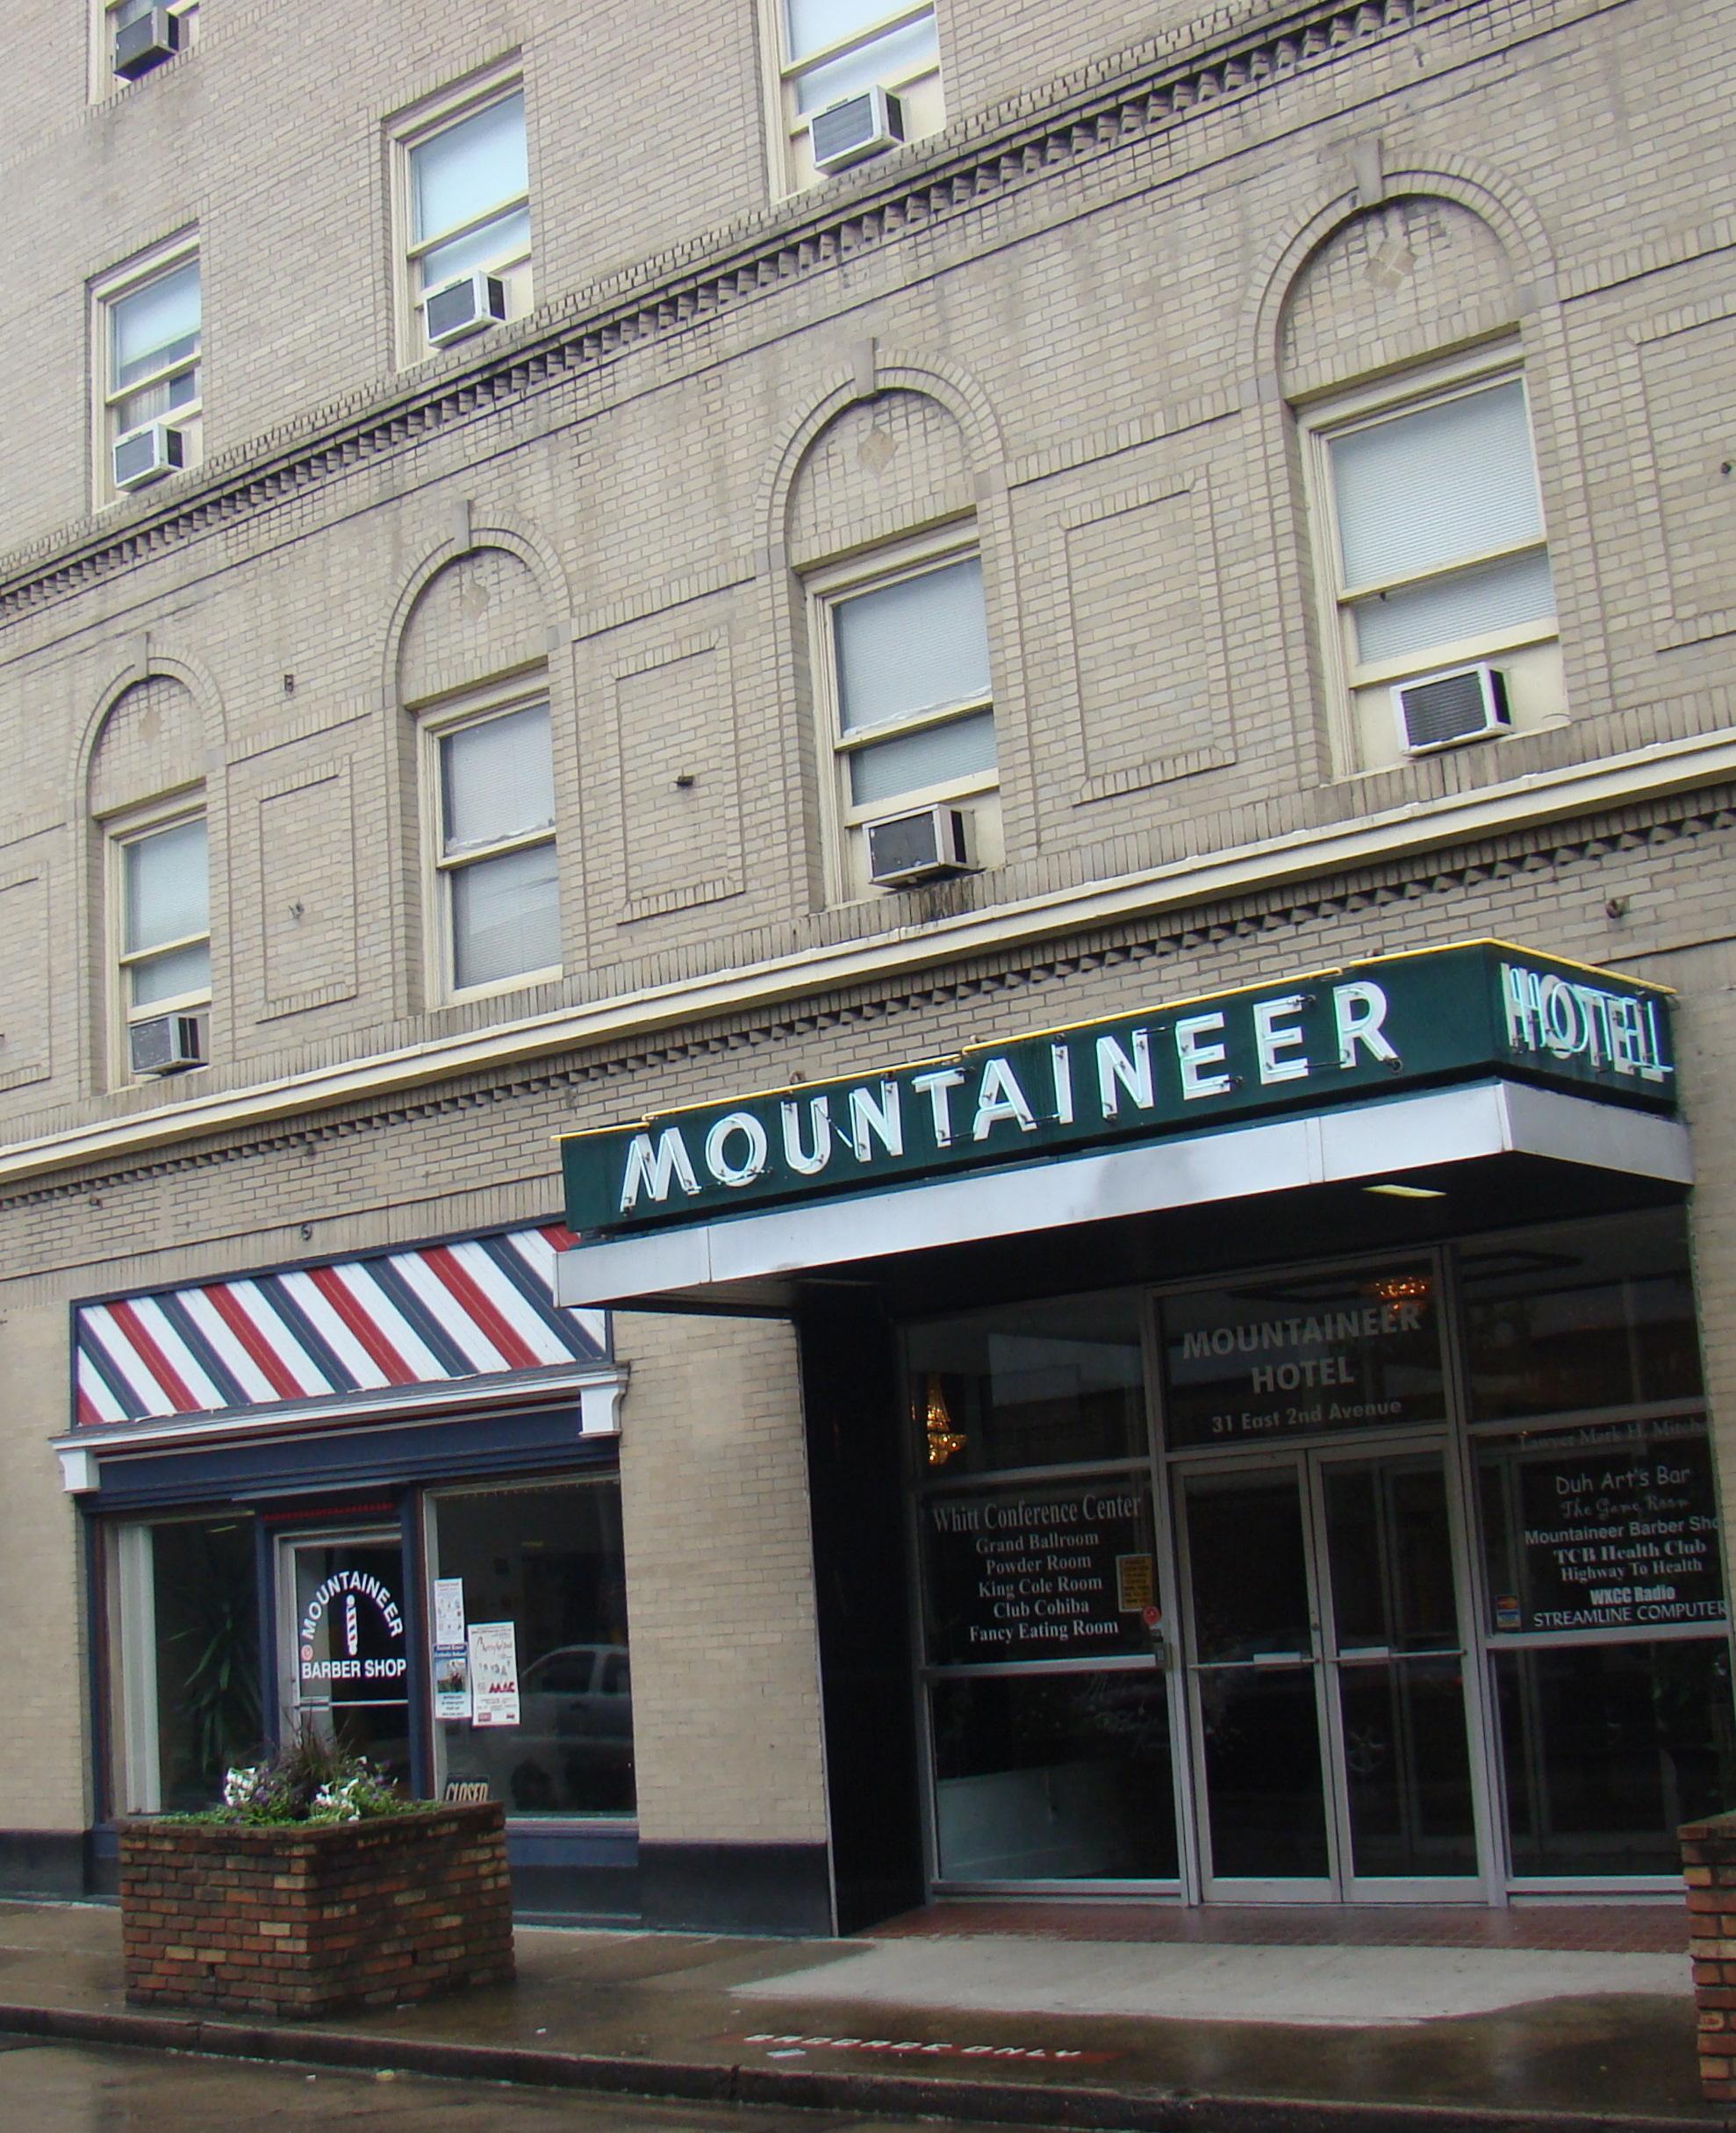 Mountaineer Hotel